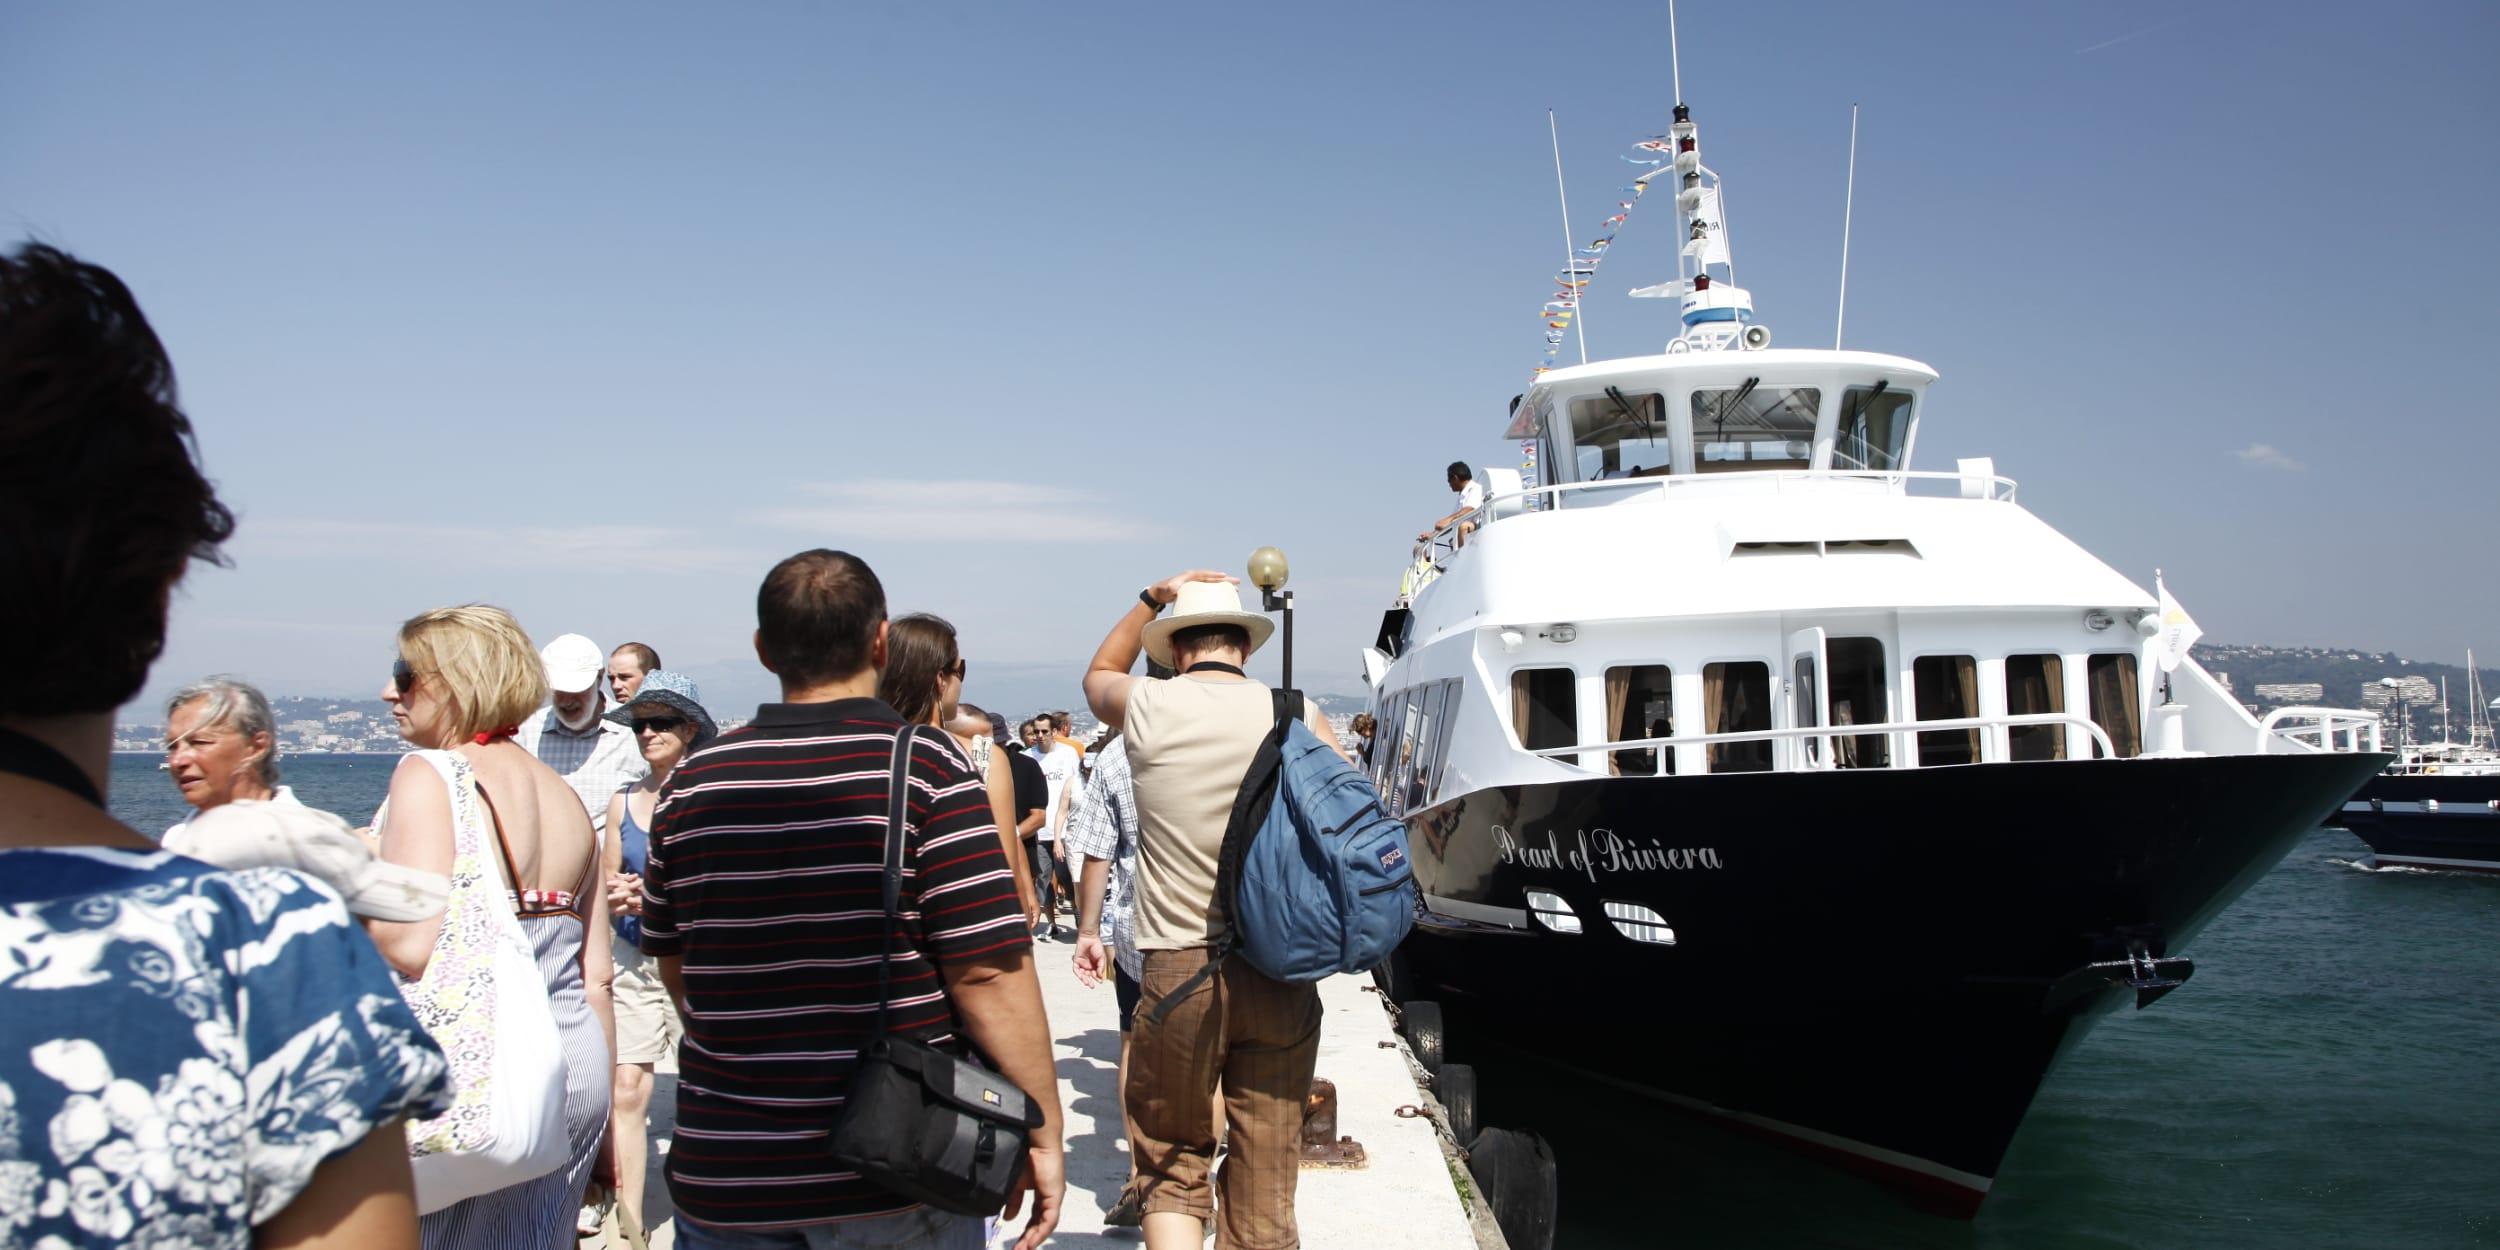 Coastal - Maritime Transport of Passengers